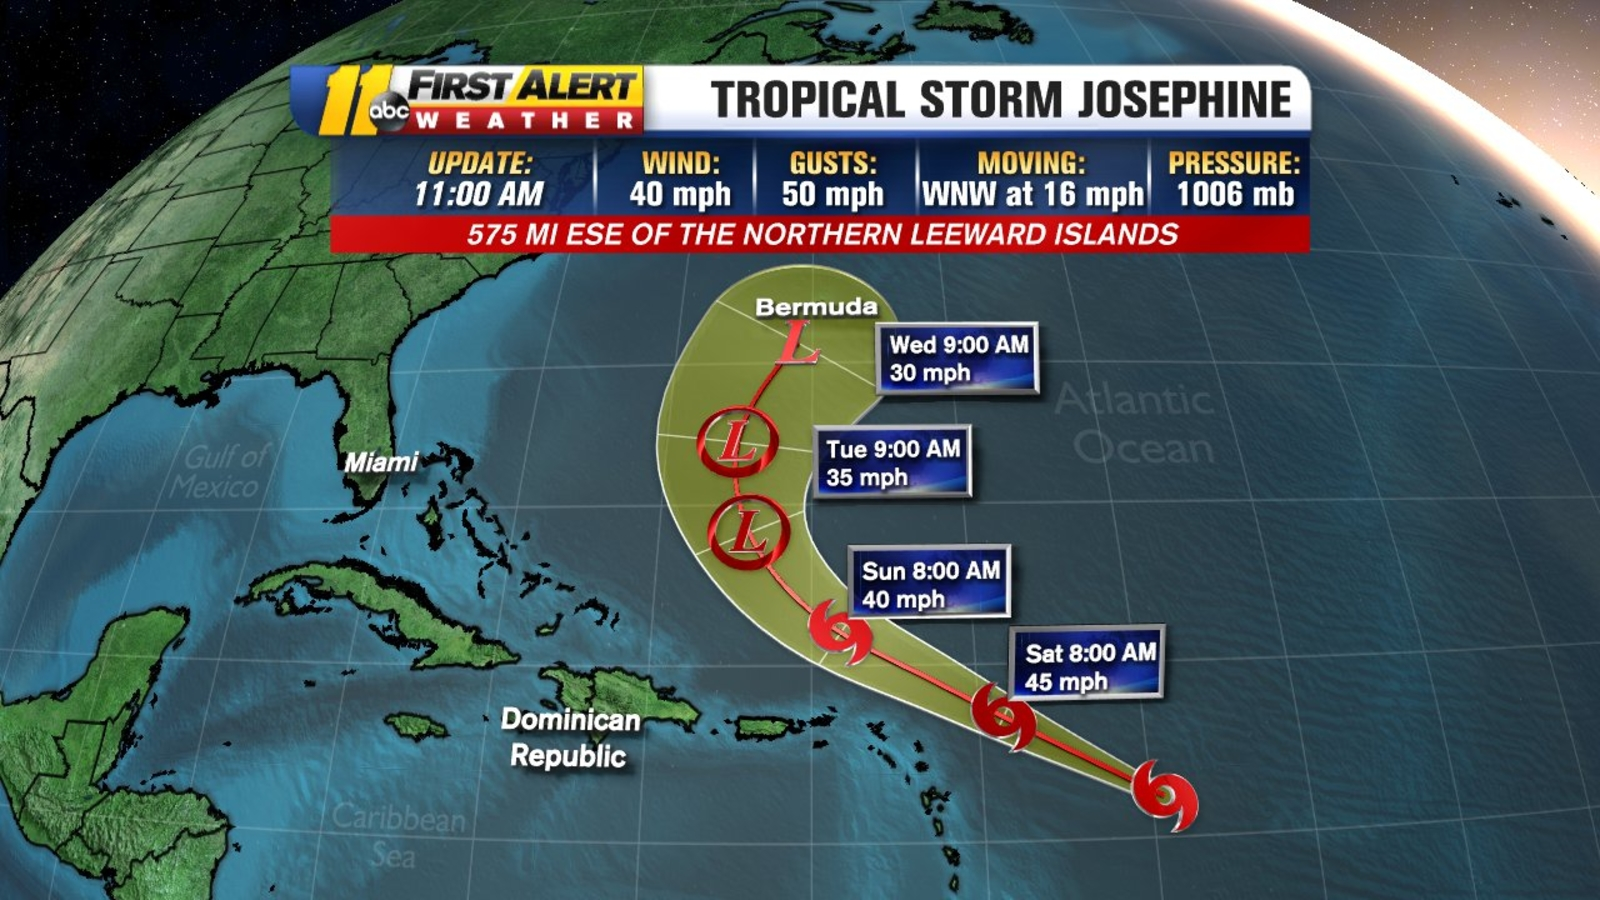 National Hurricane Center Tropical Storm Josephine Spaghetti Models Keep Storm Offshore Abc11 Raleigh Durham